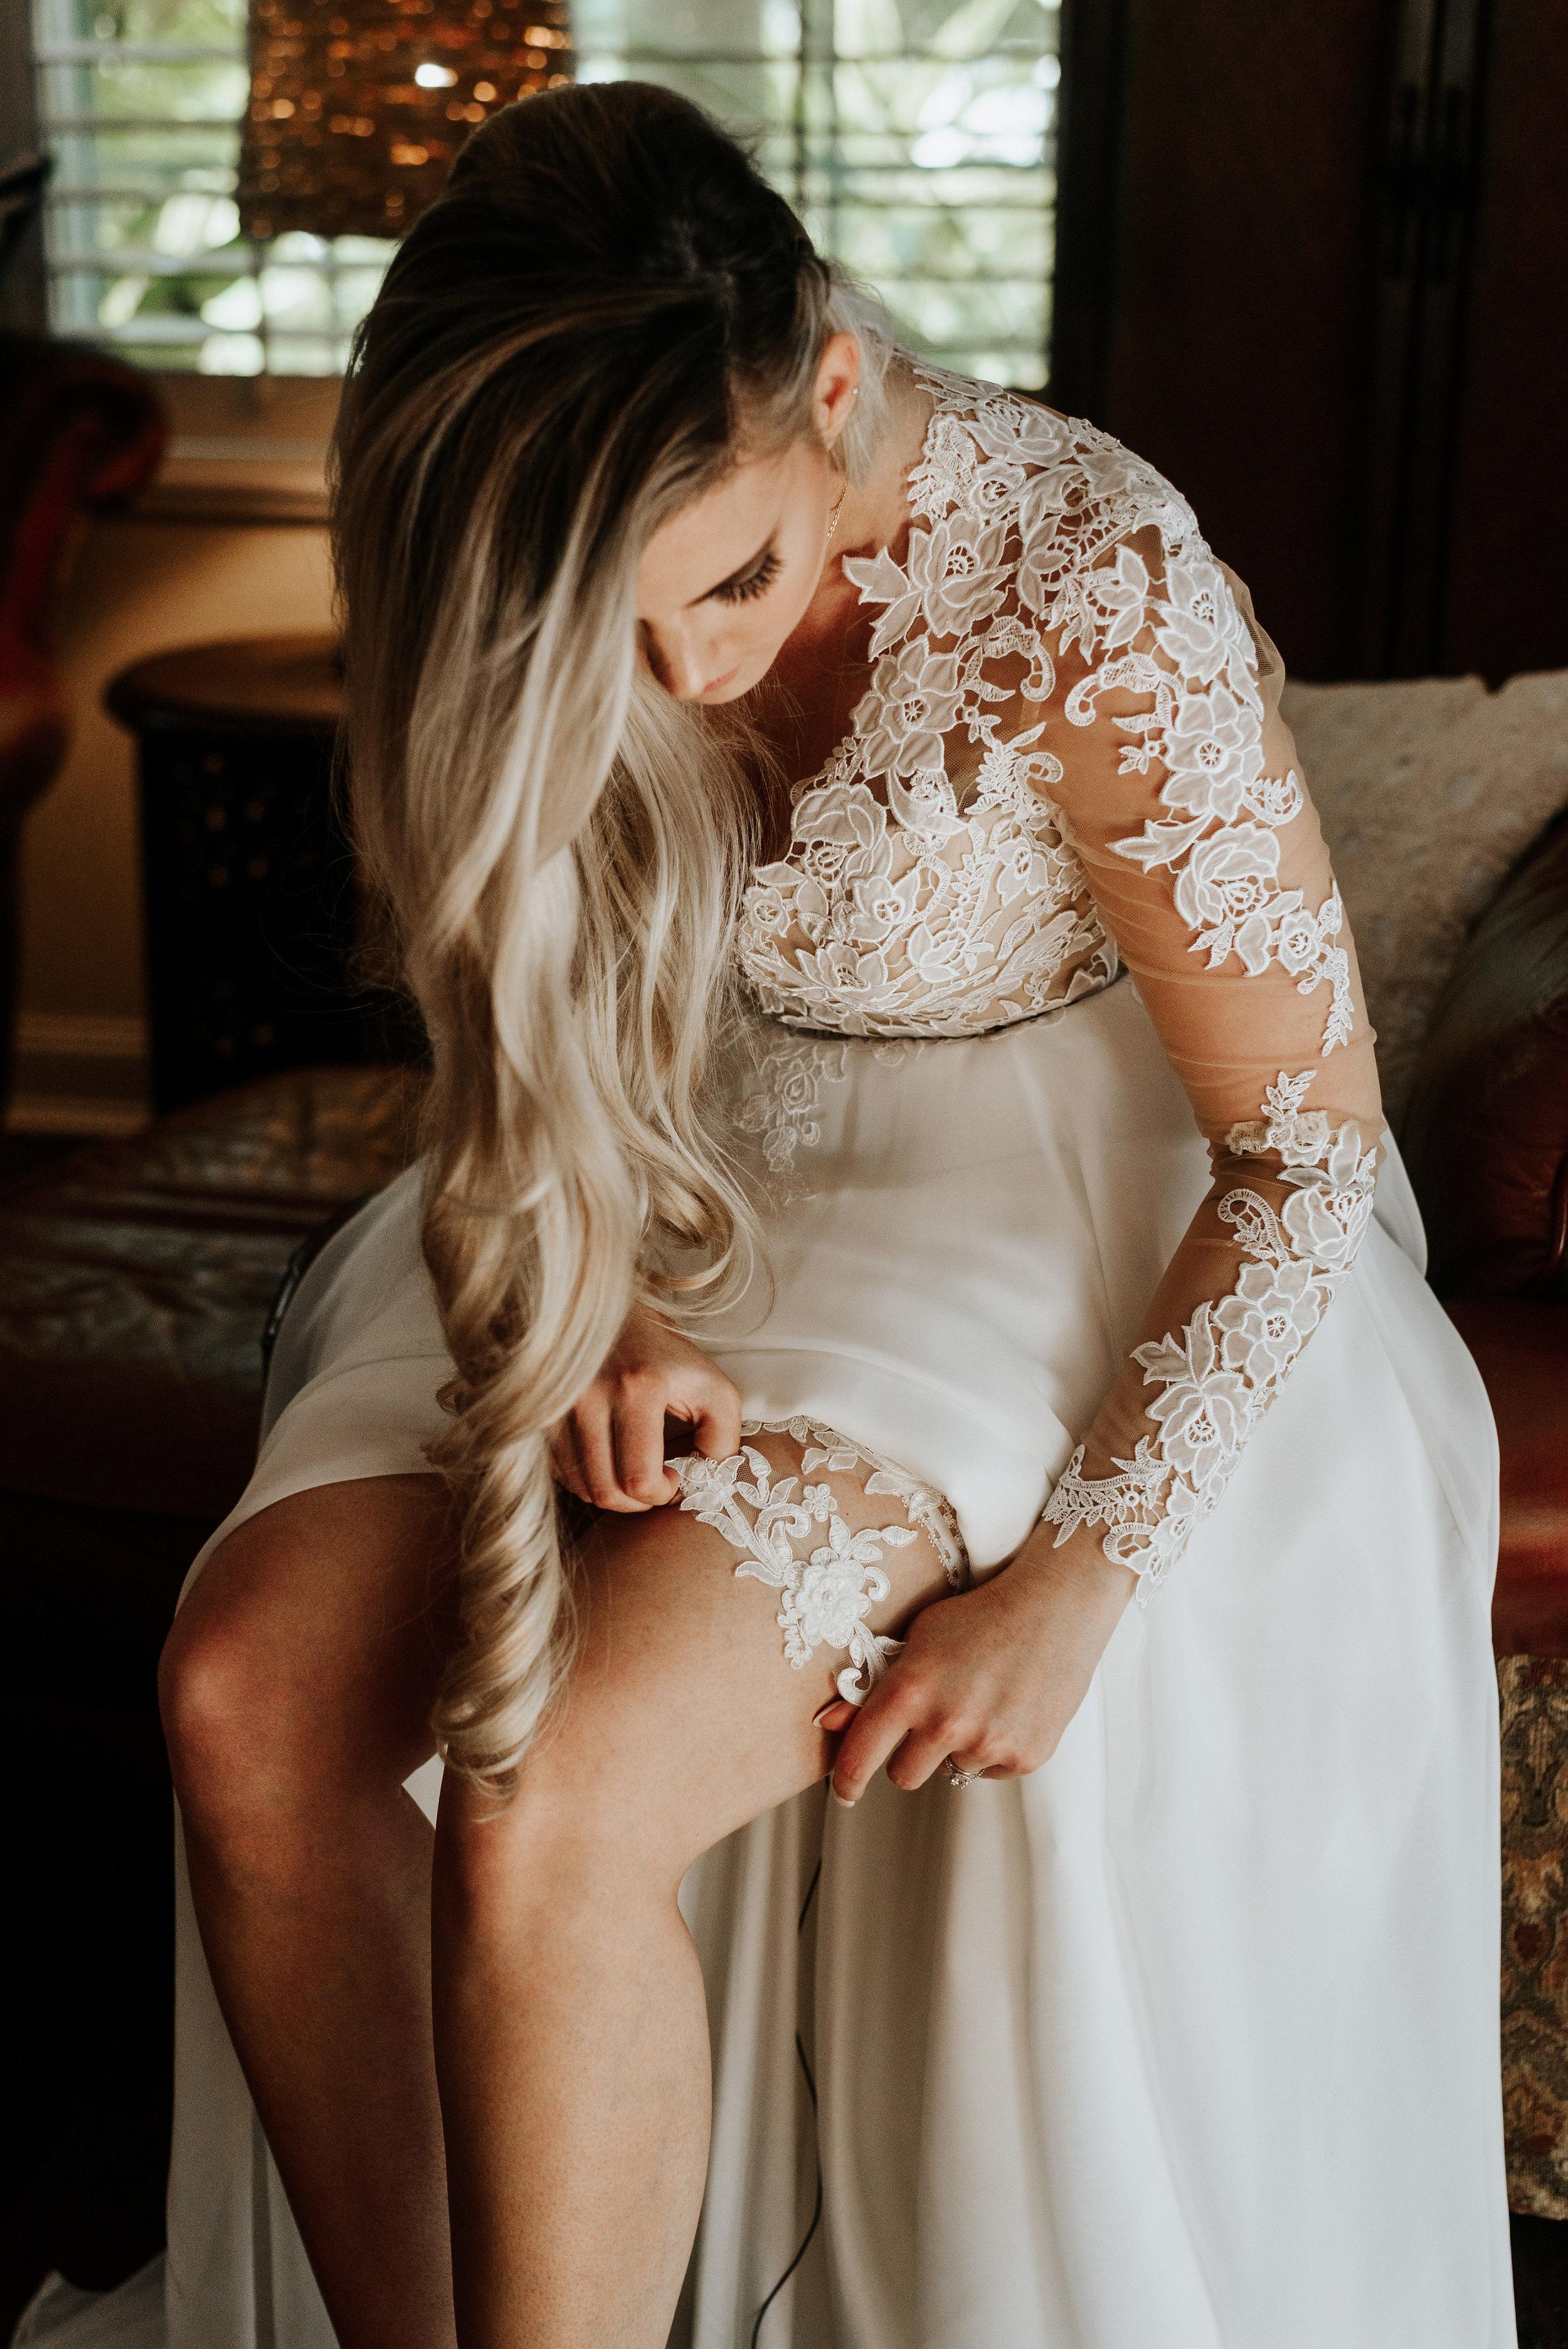 Mikenzi_Brad_Wedding_The_Delamater_House_New_Smyrna_Beach_Florida_Photography_by_V_4499.jpg